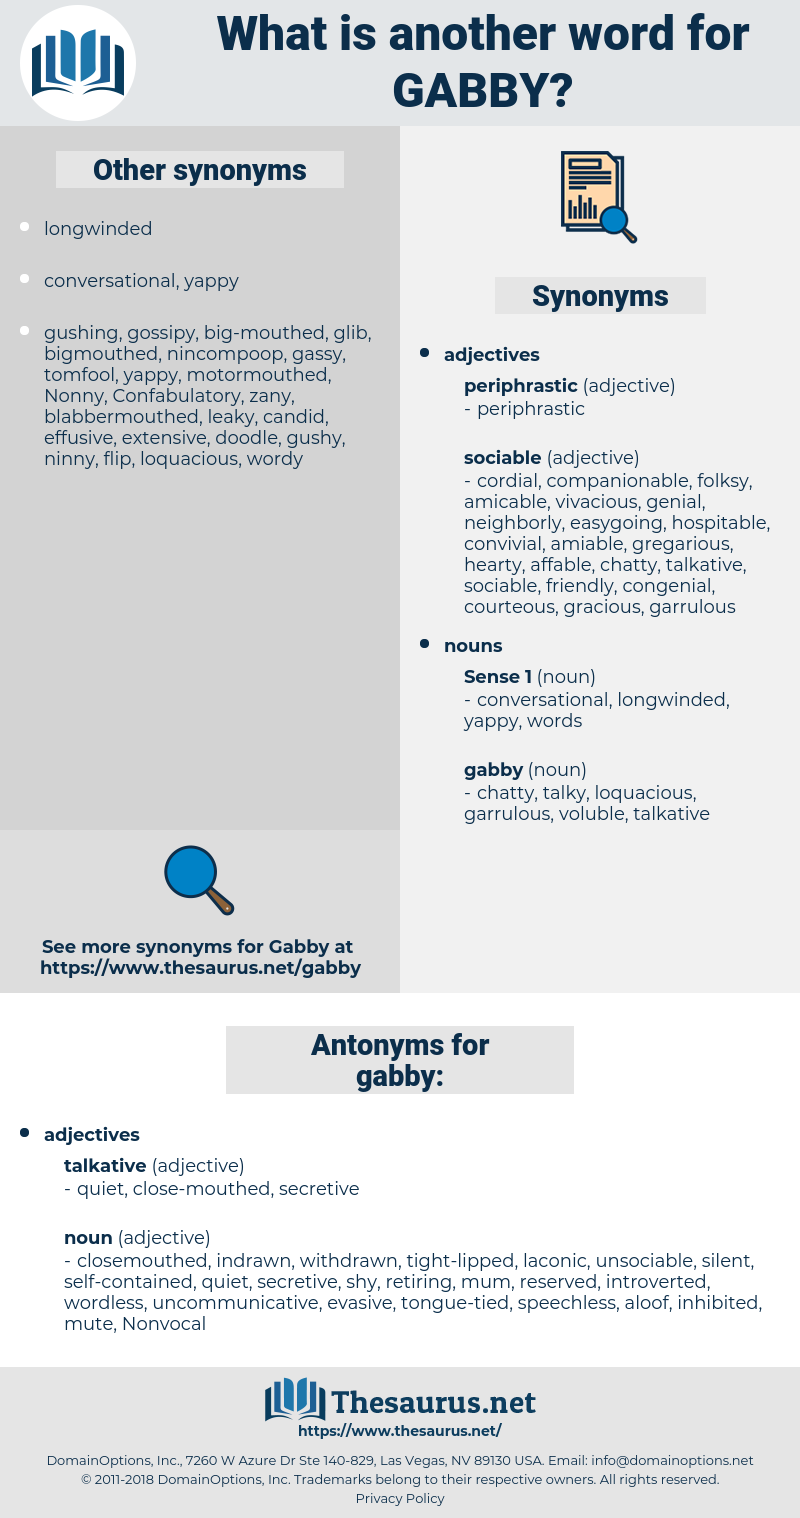 gabby, synonym gabby, another word for gabby, words like gabby, thesaurus gabby